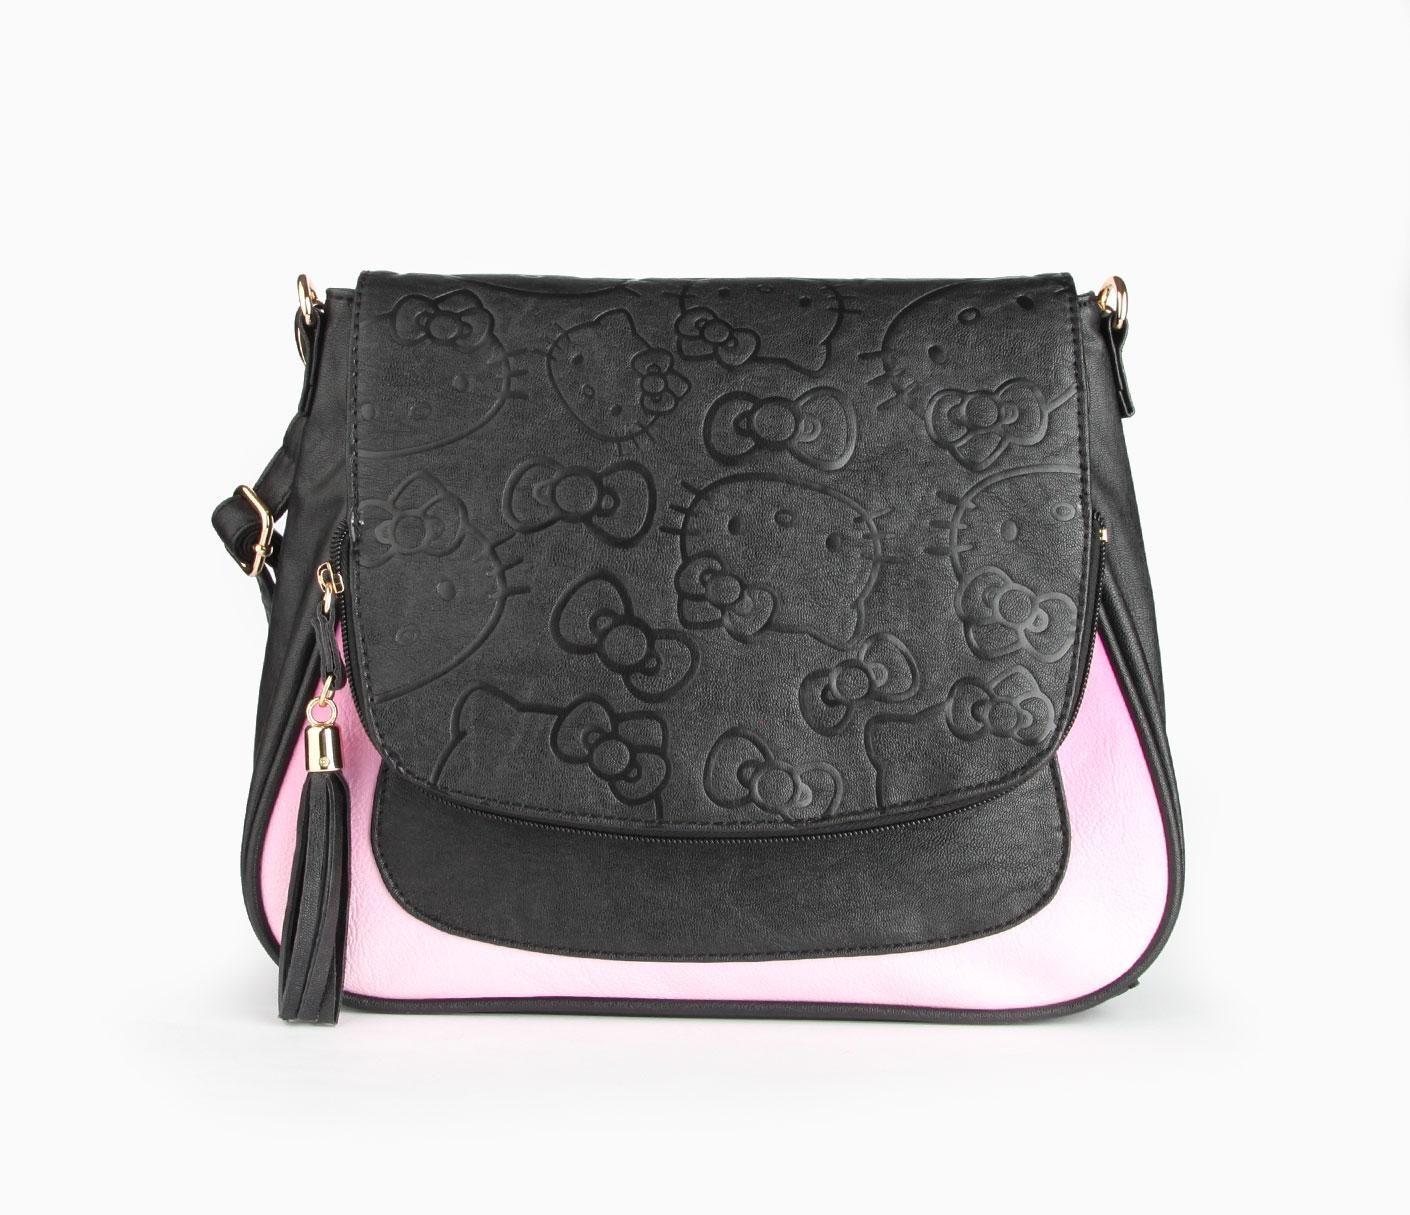 b2f54a6bc Hello Kitty Crossbody Bag: Purple Ombre | Sanrio Bags | Hello kitty ...